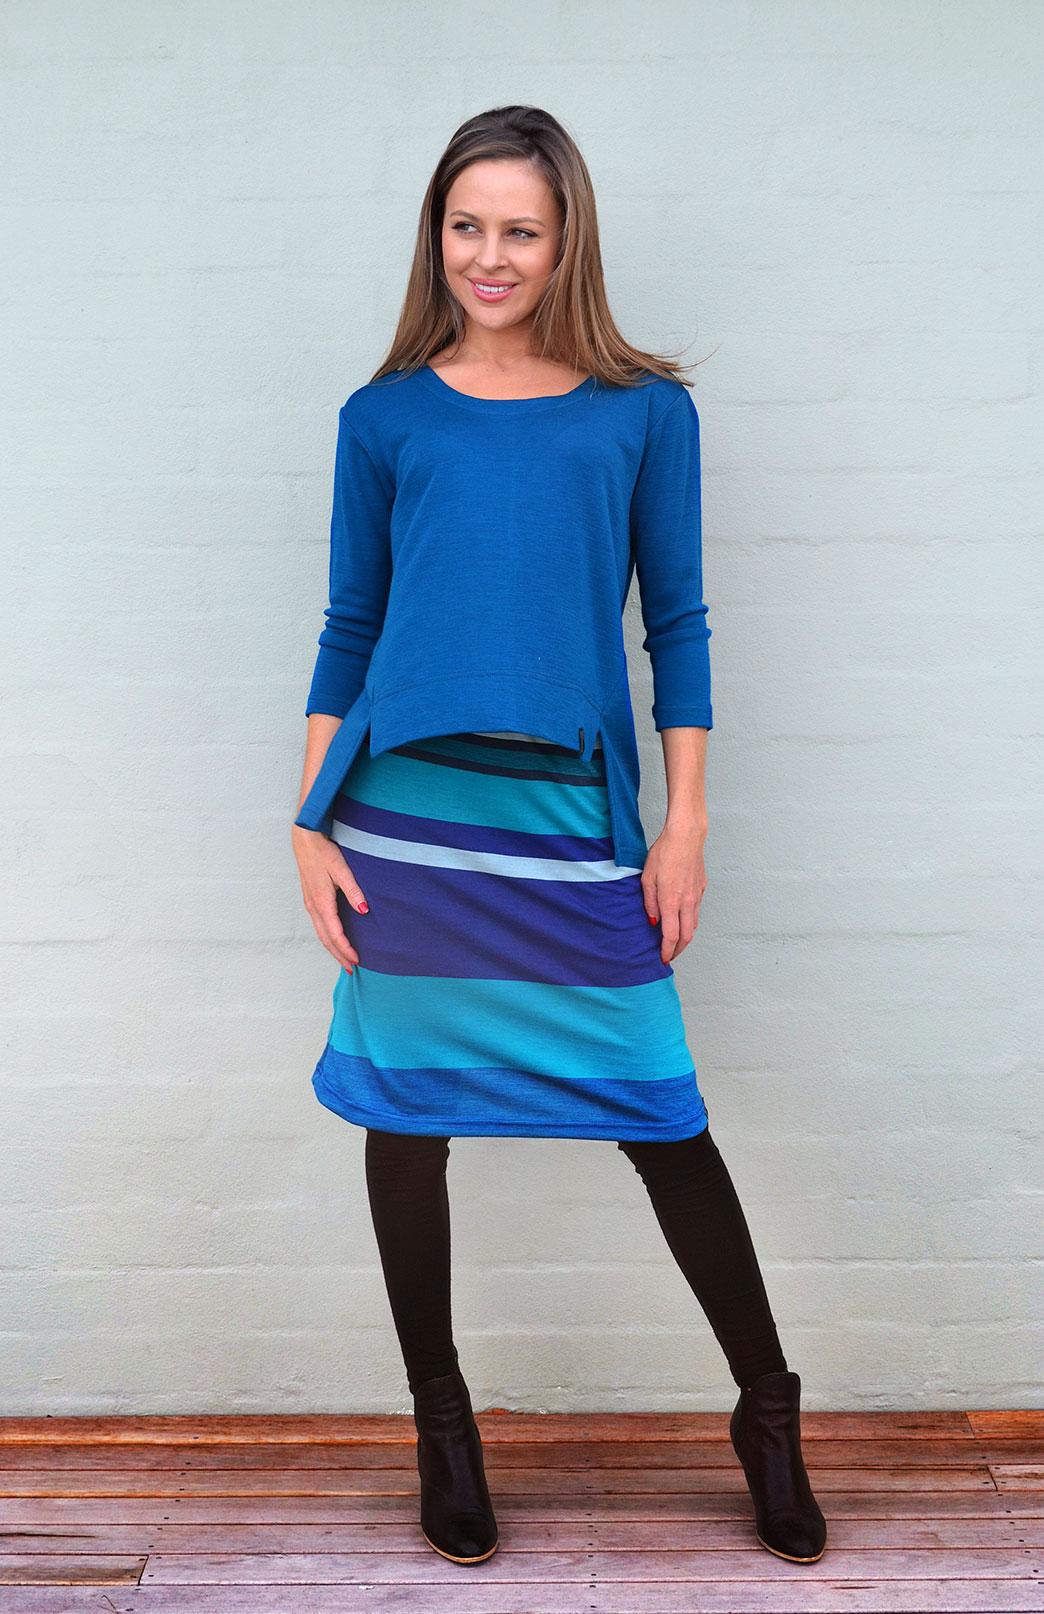 A-line Skirt - Women's Blue Multi Stripe A-Line Skirt with elastic waistband - Smitten Merino Tasmania Australia